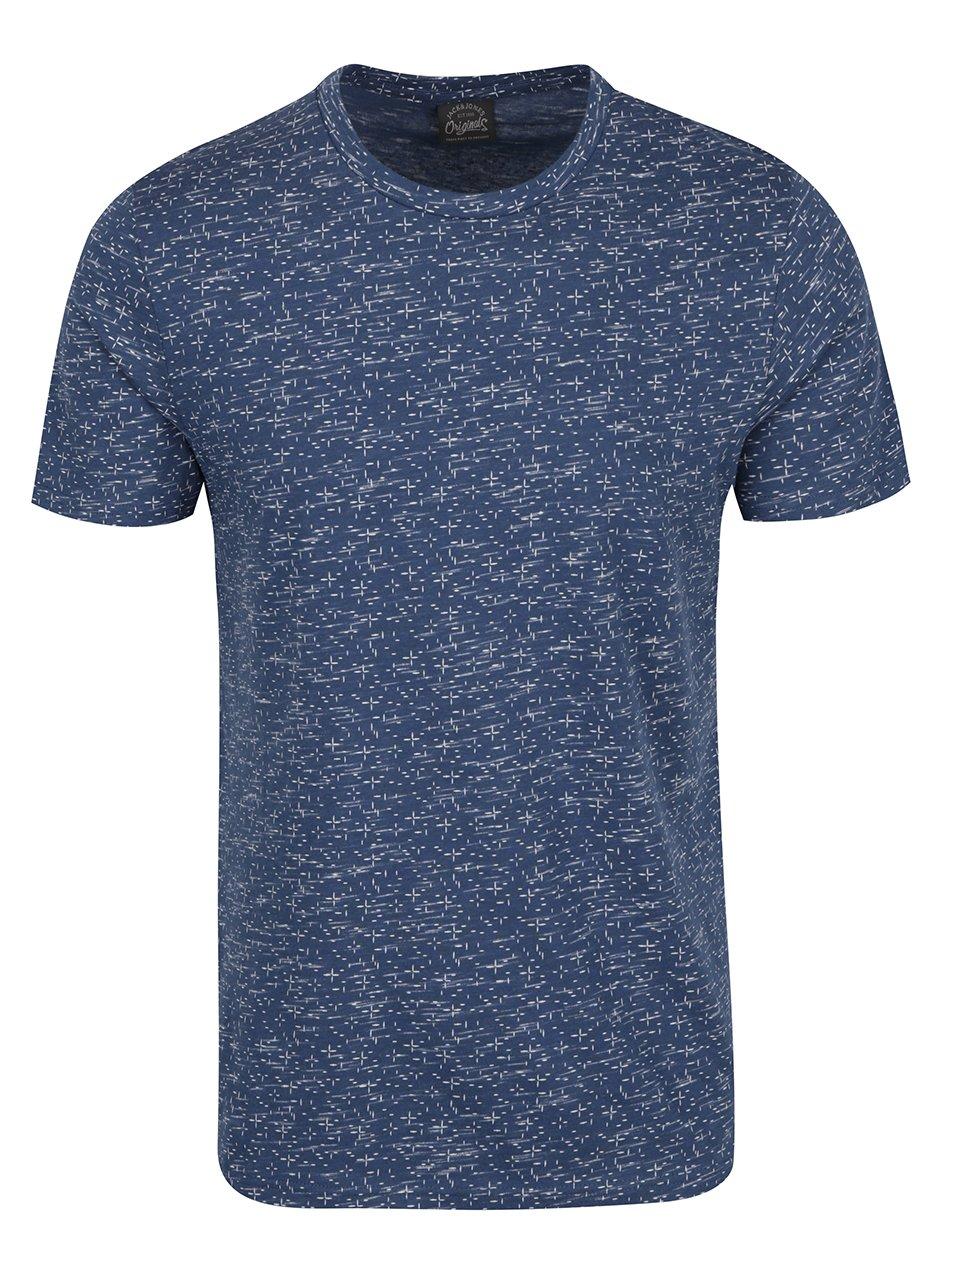 Modré vzorované tričko s krátkým rukávem Jack & Jones Lineup